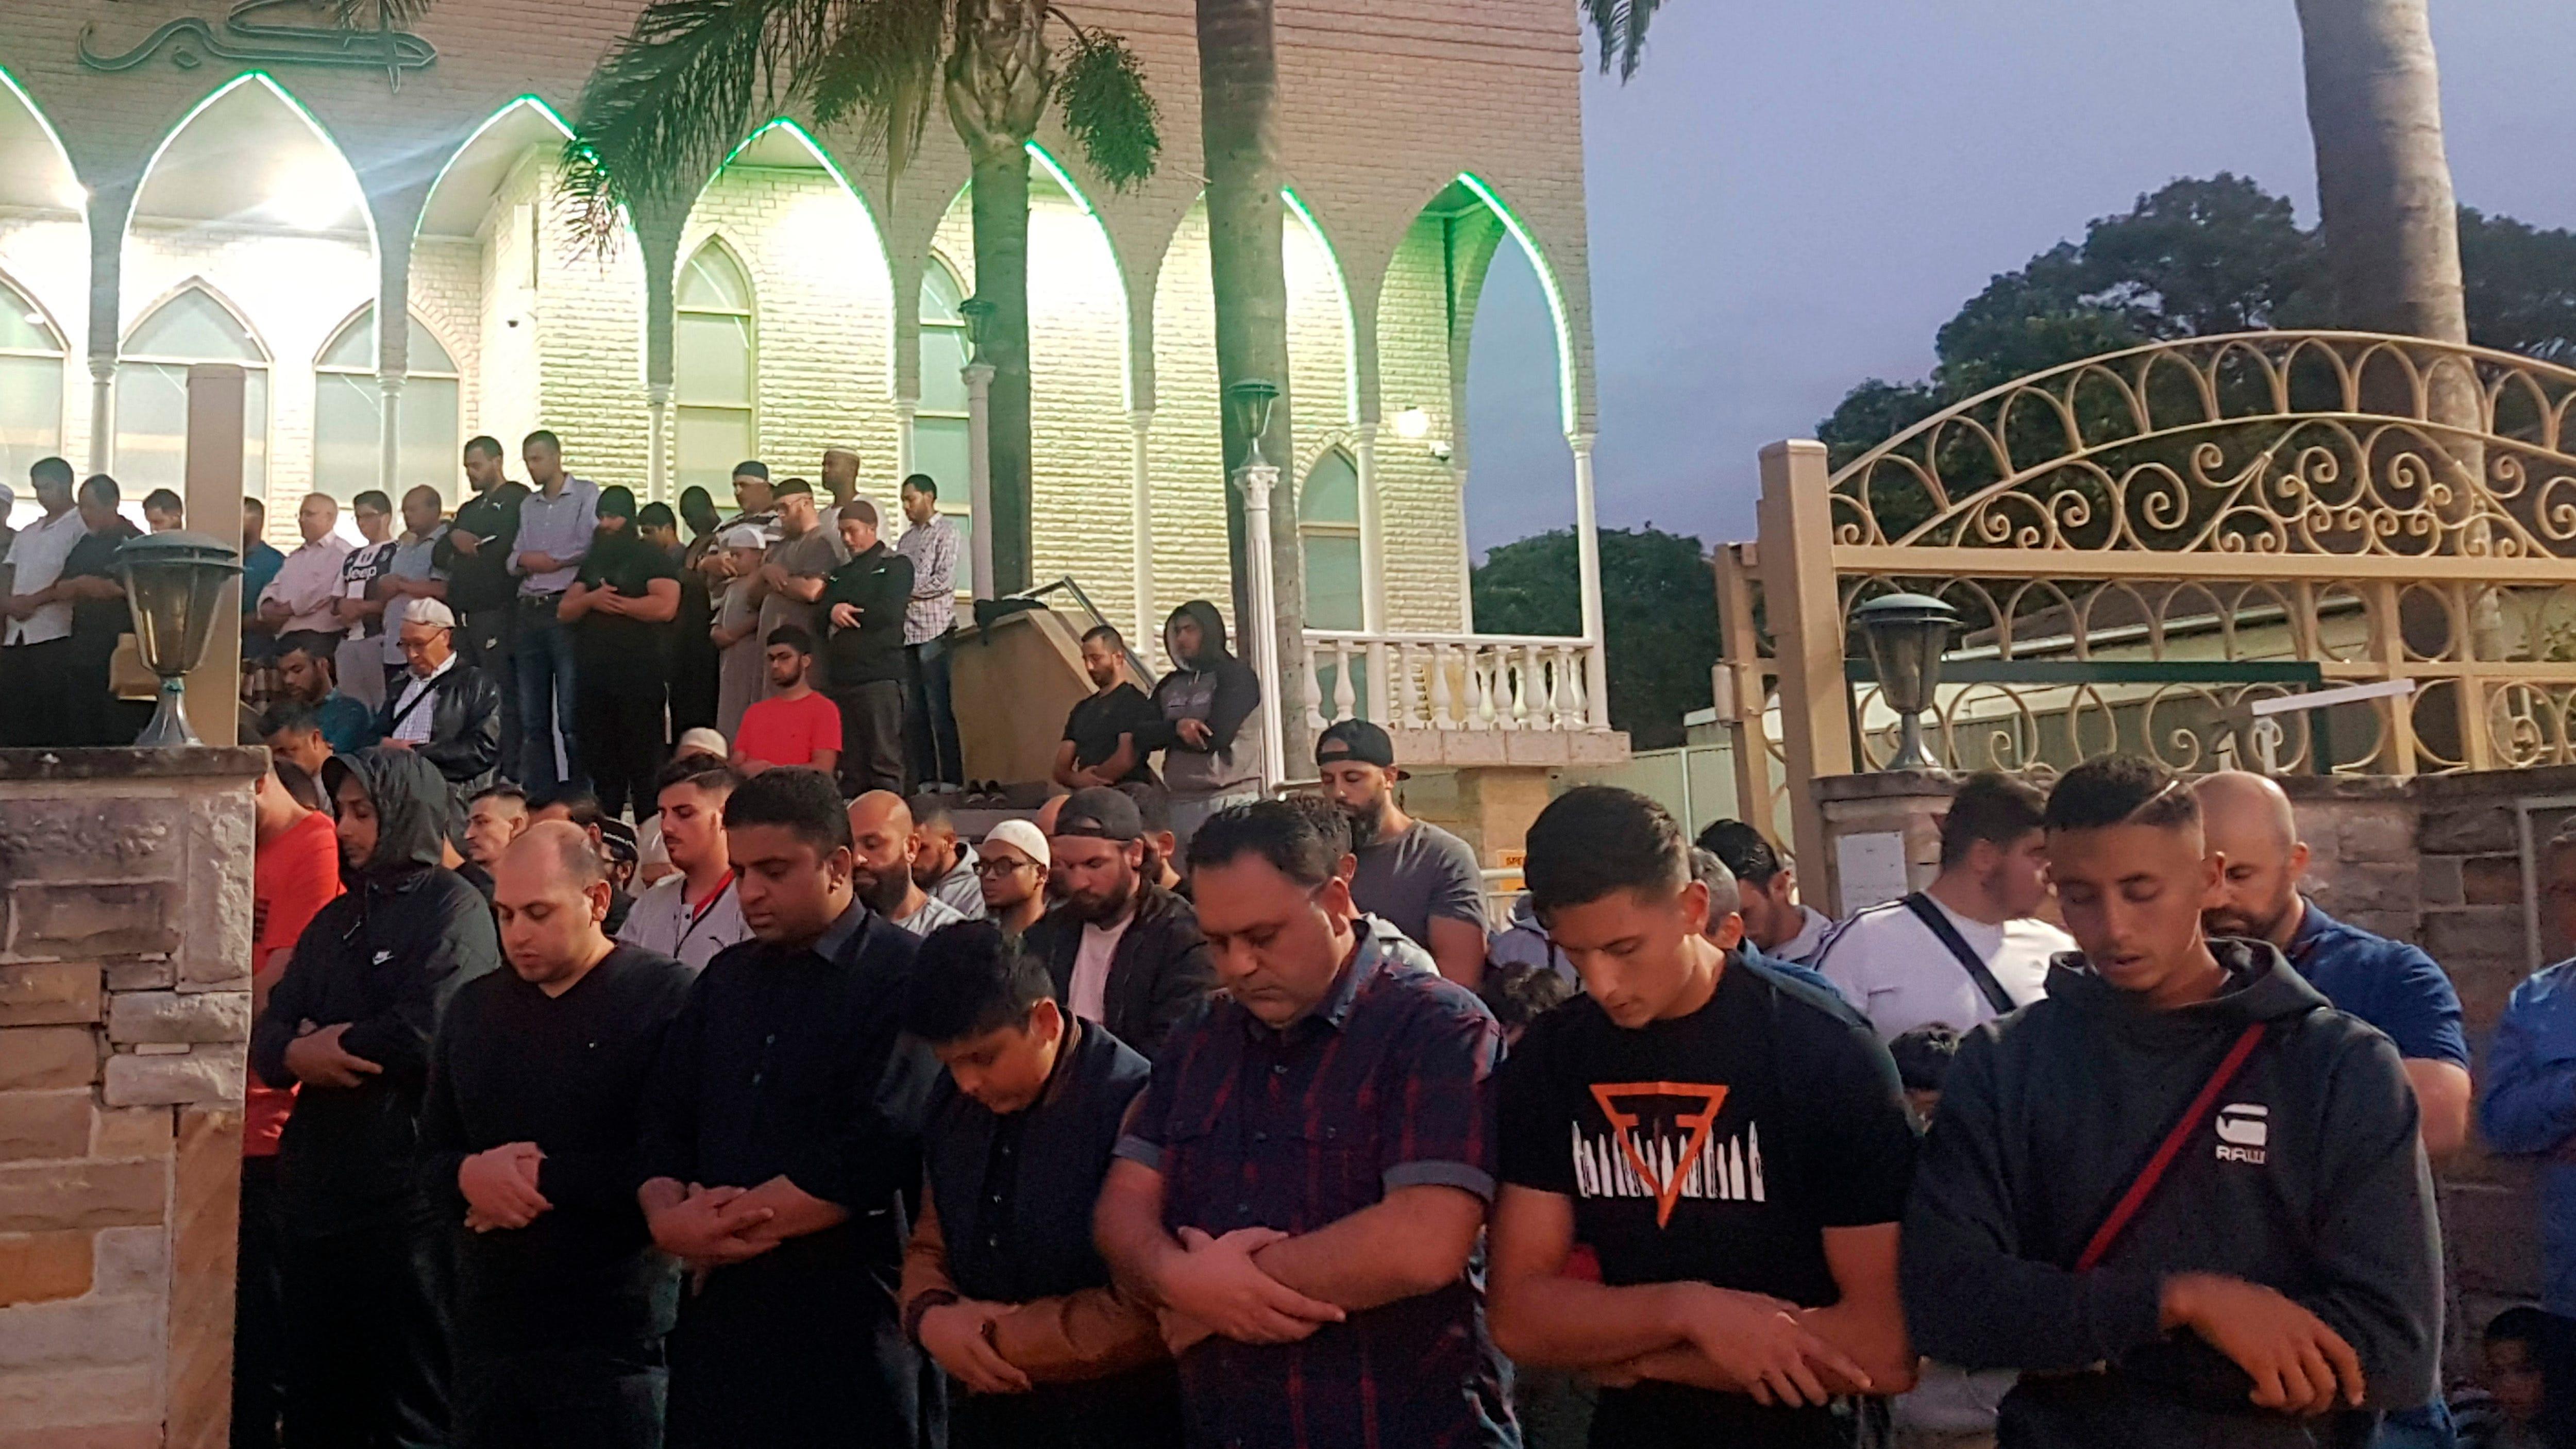 Masjid New Zealand Pinterest: Metro Area's Muslim Community Reels From New Zealand